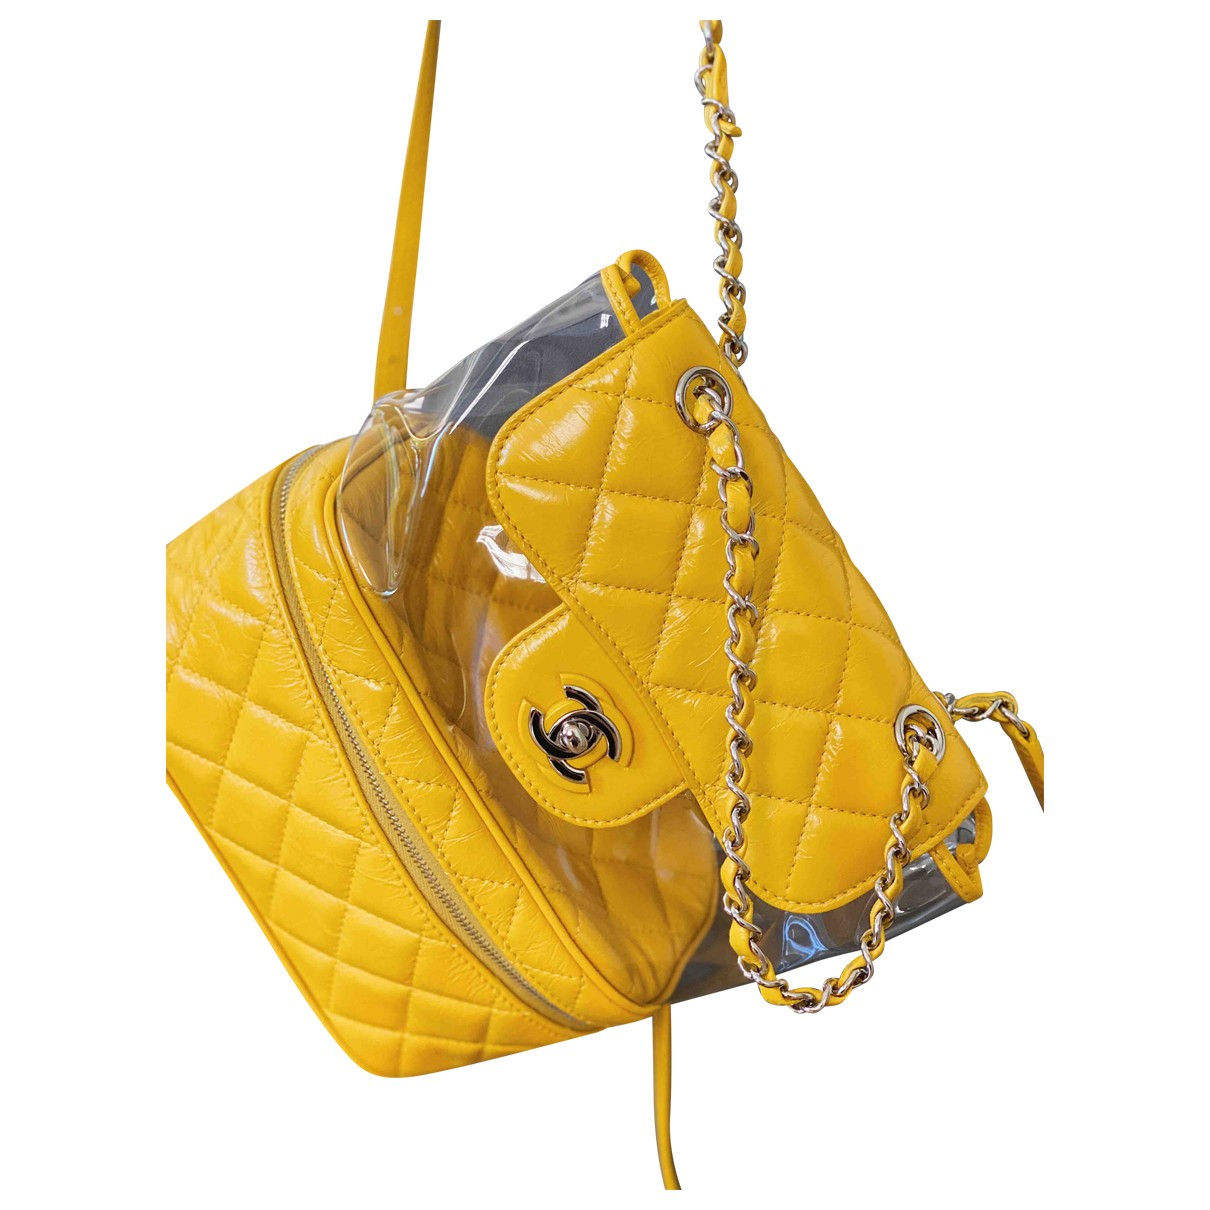 Chanel \N Rucksaecke in  Gelb Lackleder